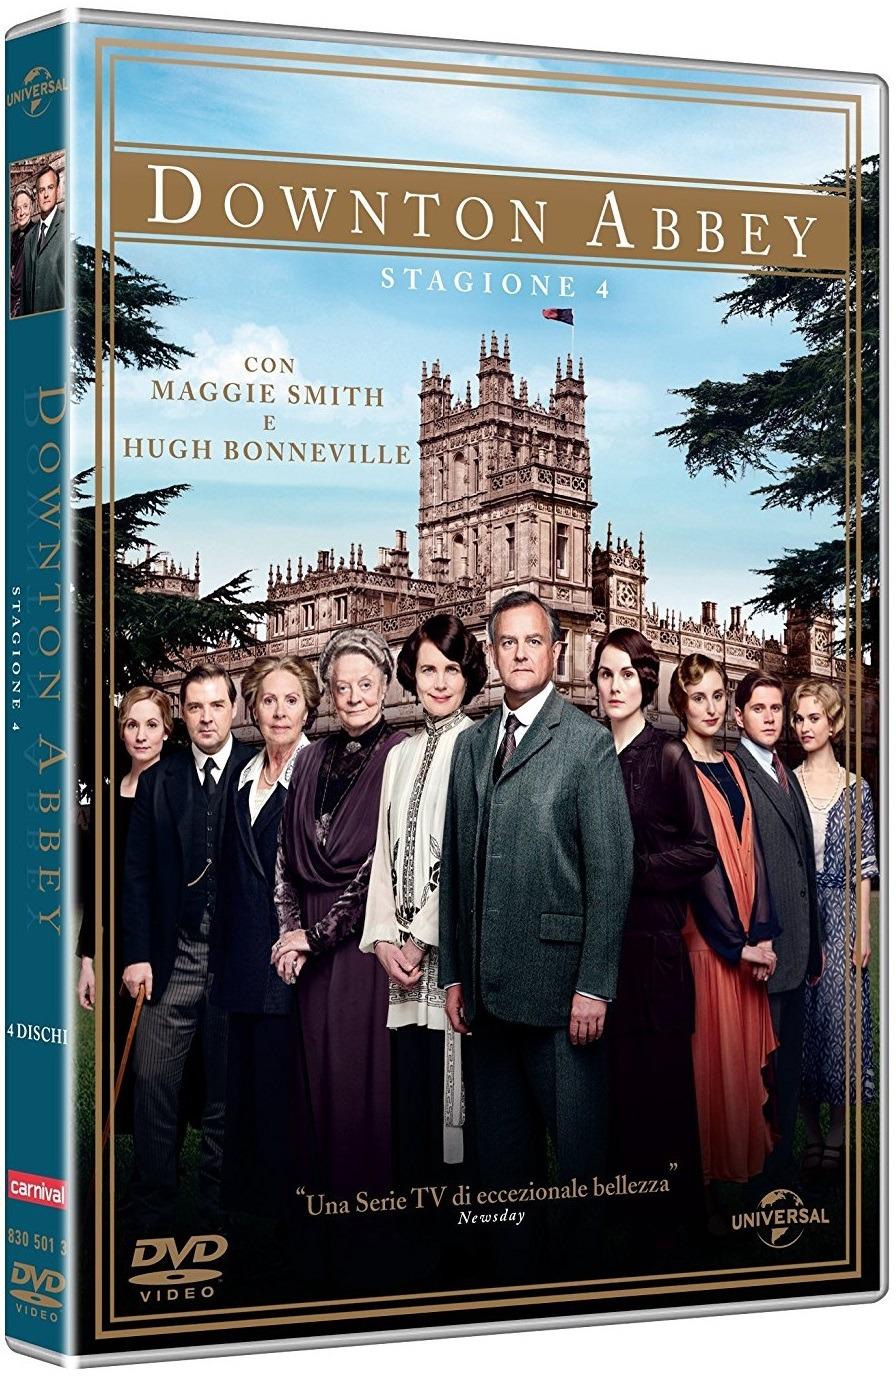 Downton Abbey - Stagione 04 - Carter,bonneville,james-collier,dockery,froggatt,mcshera,nicol,finneran - Film - Universal Pictures - 5053083050139 -